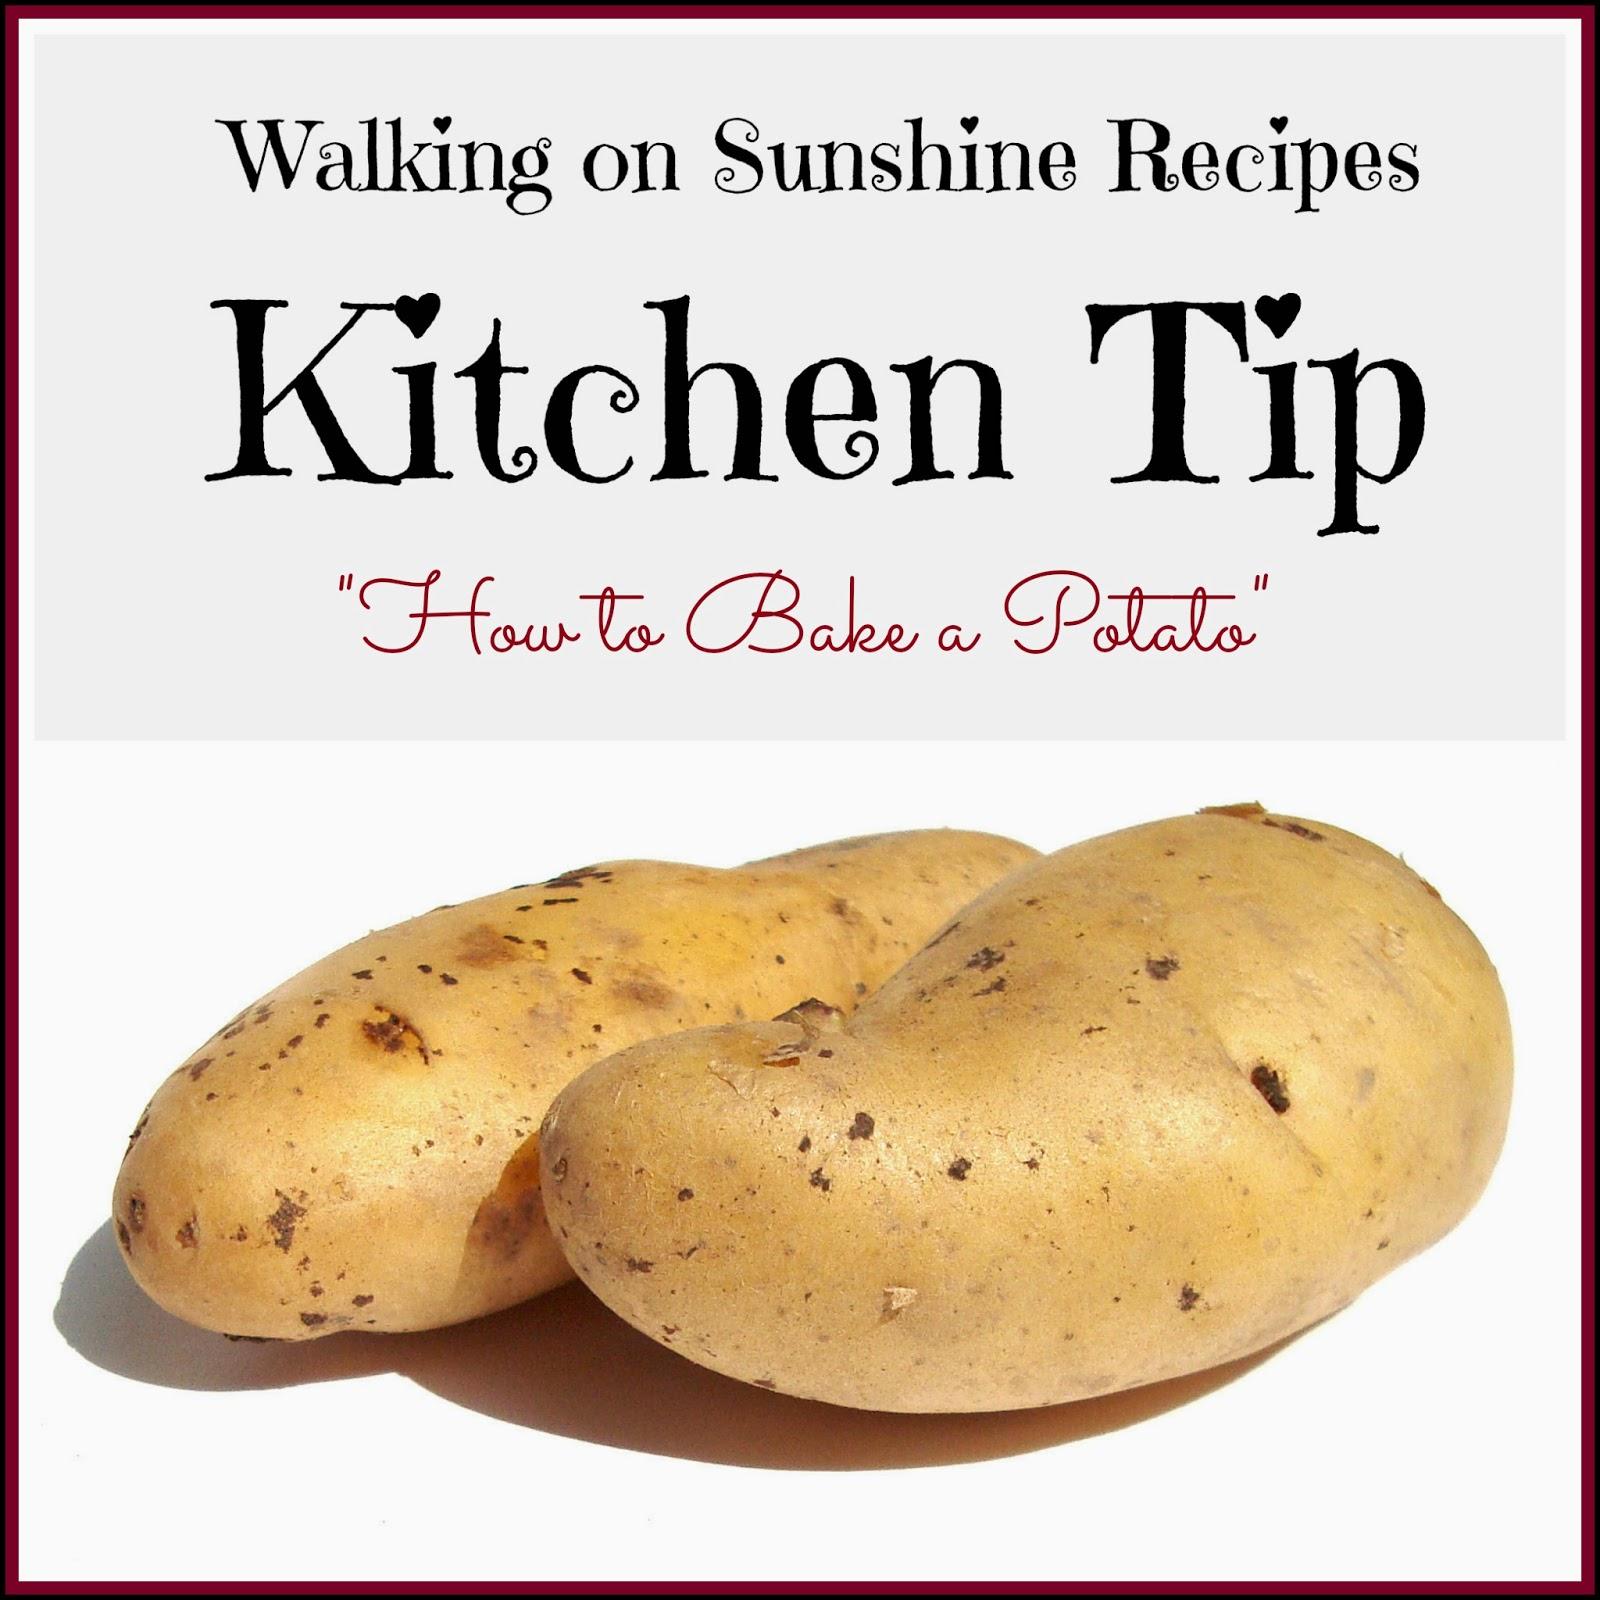 How To Bake A Potato Kitchen Tip Walking On Sunshine Recipes